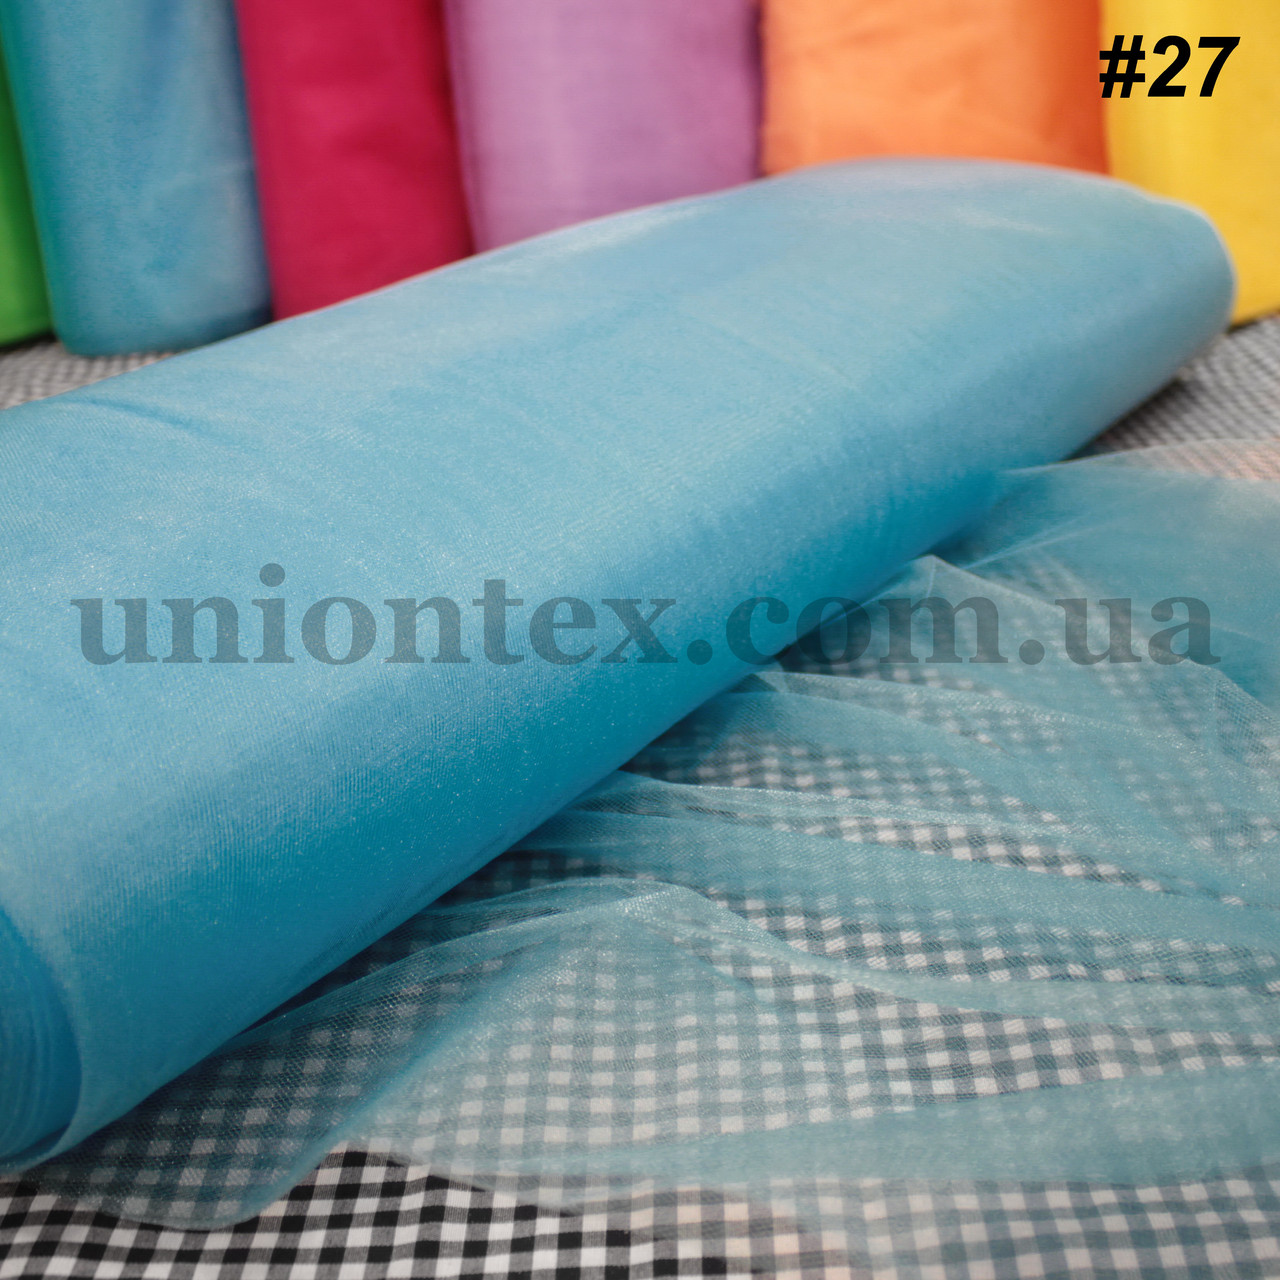 Фатин средней жесткости Kristal tul голубая бирюза, ширина 3м